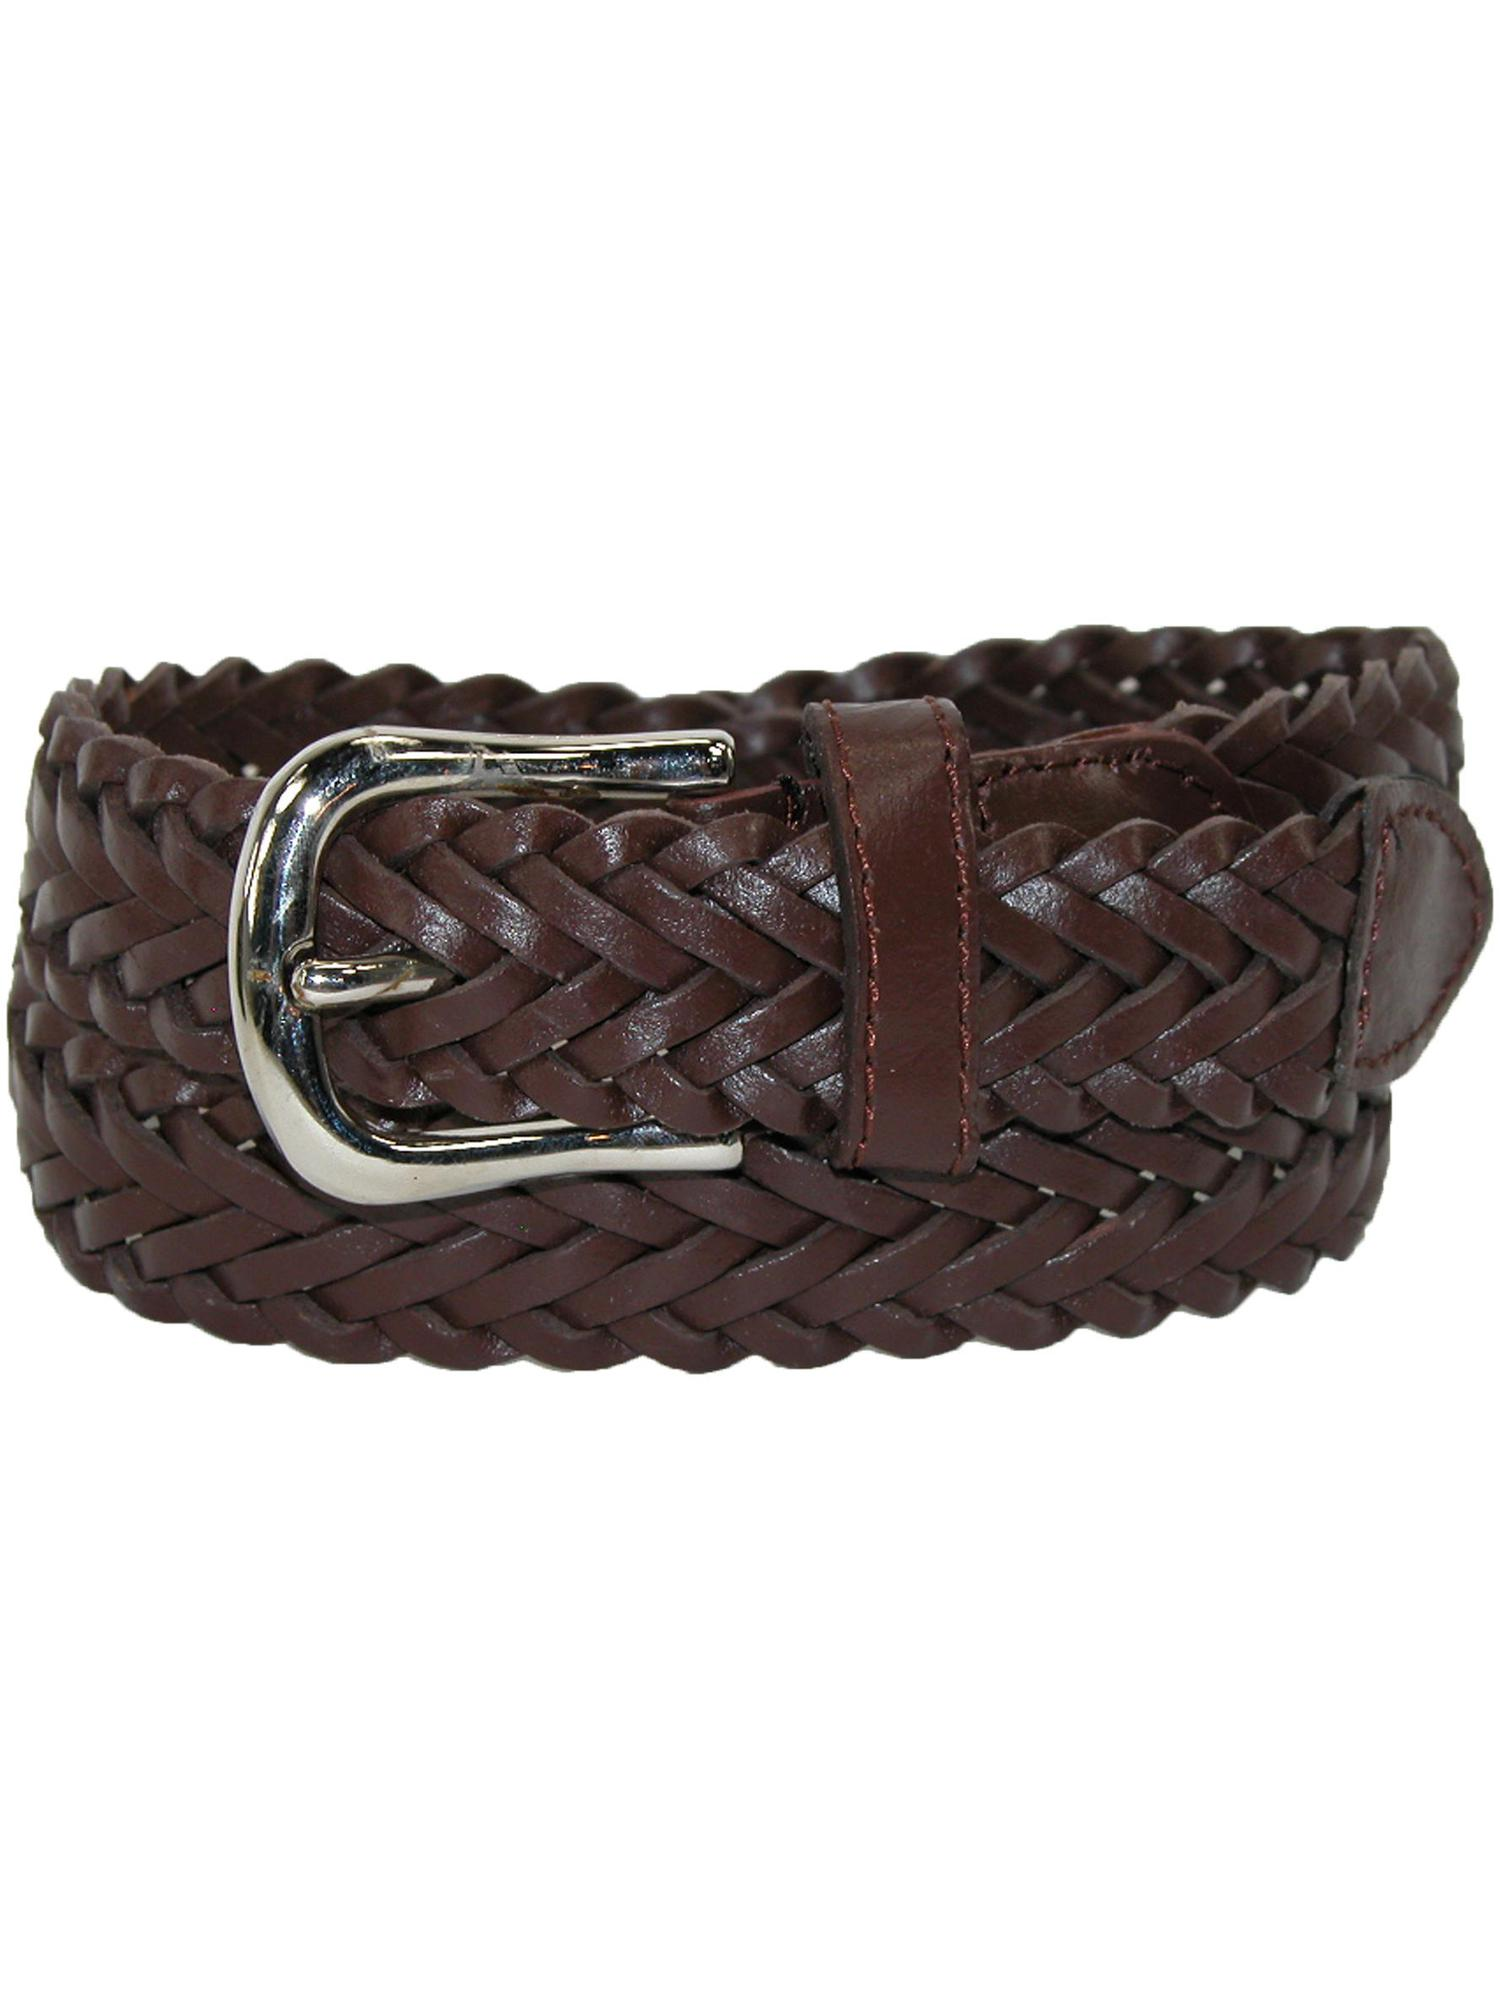 Boy's Leather 3/4 Inch Adjustable Braided Dress Belt